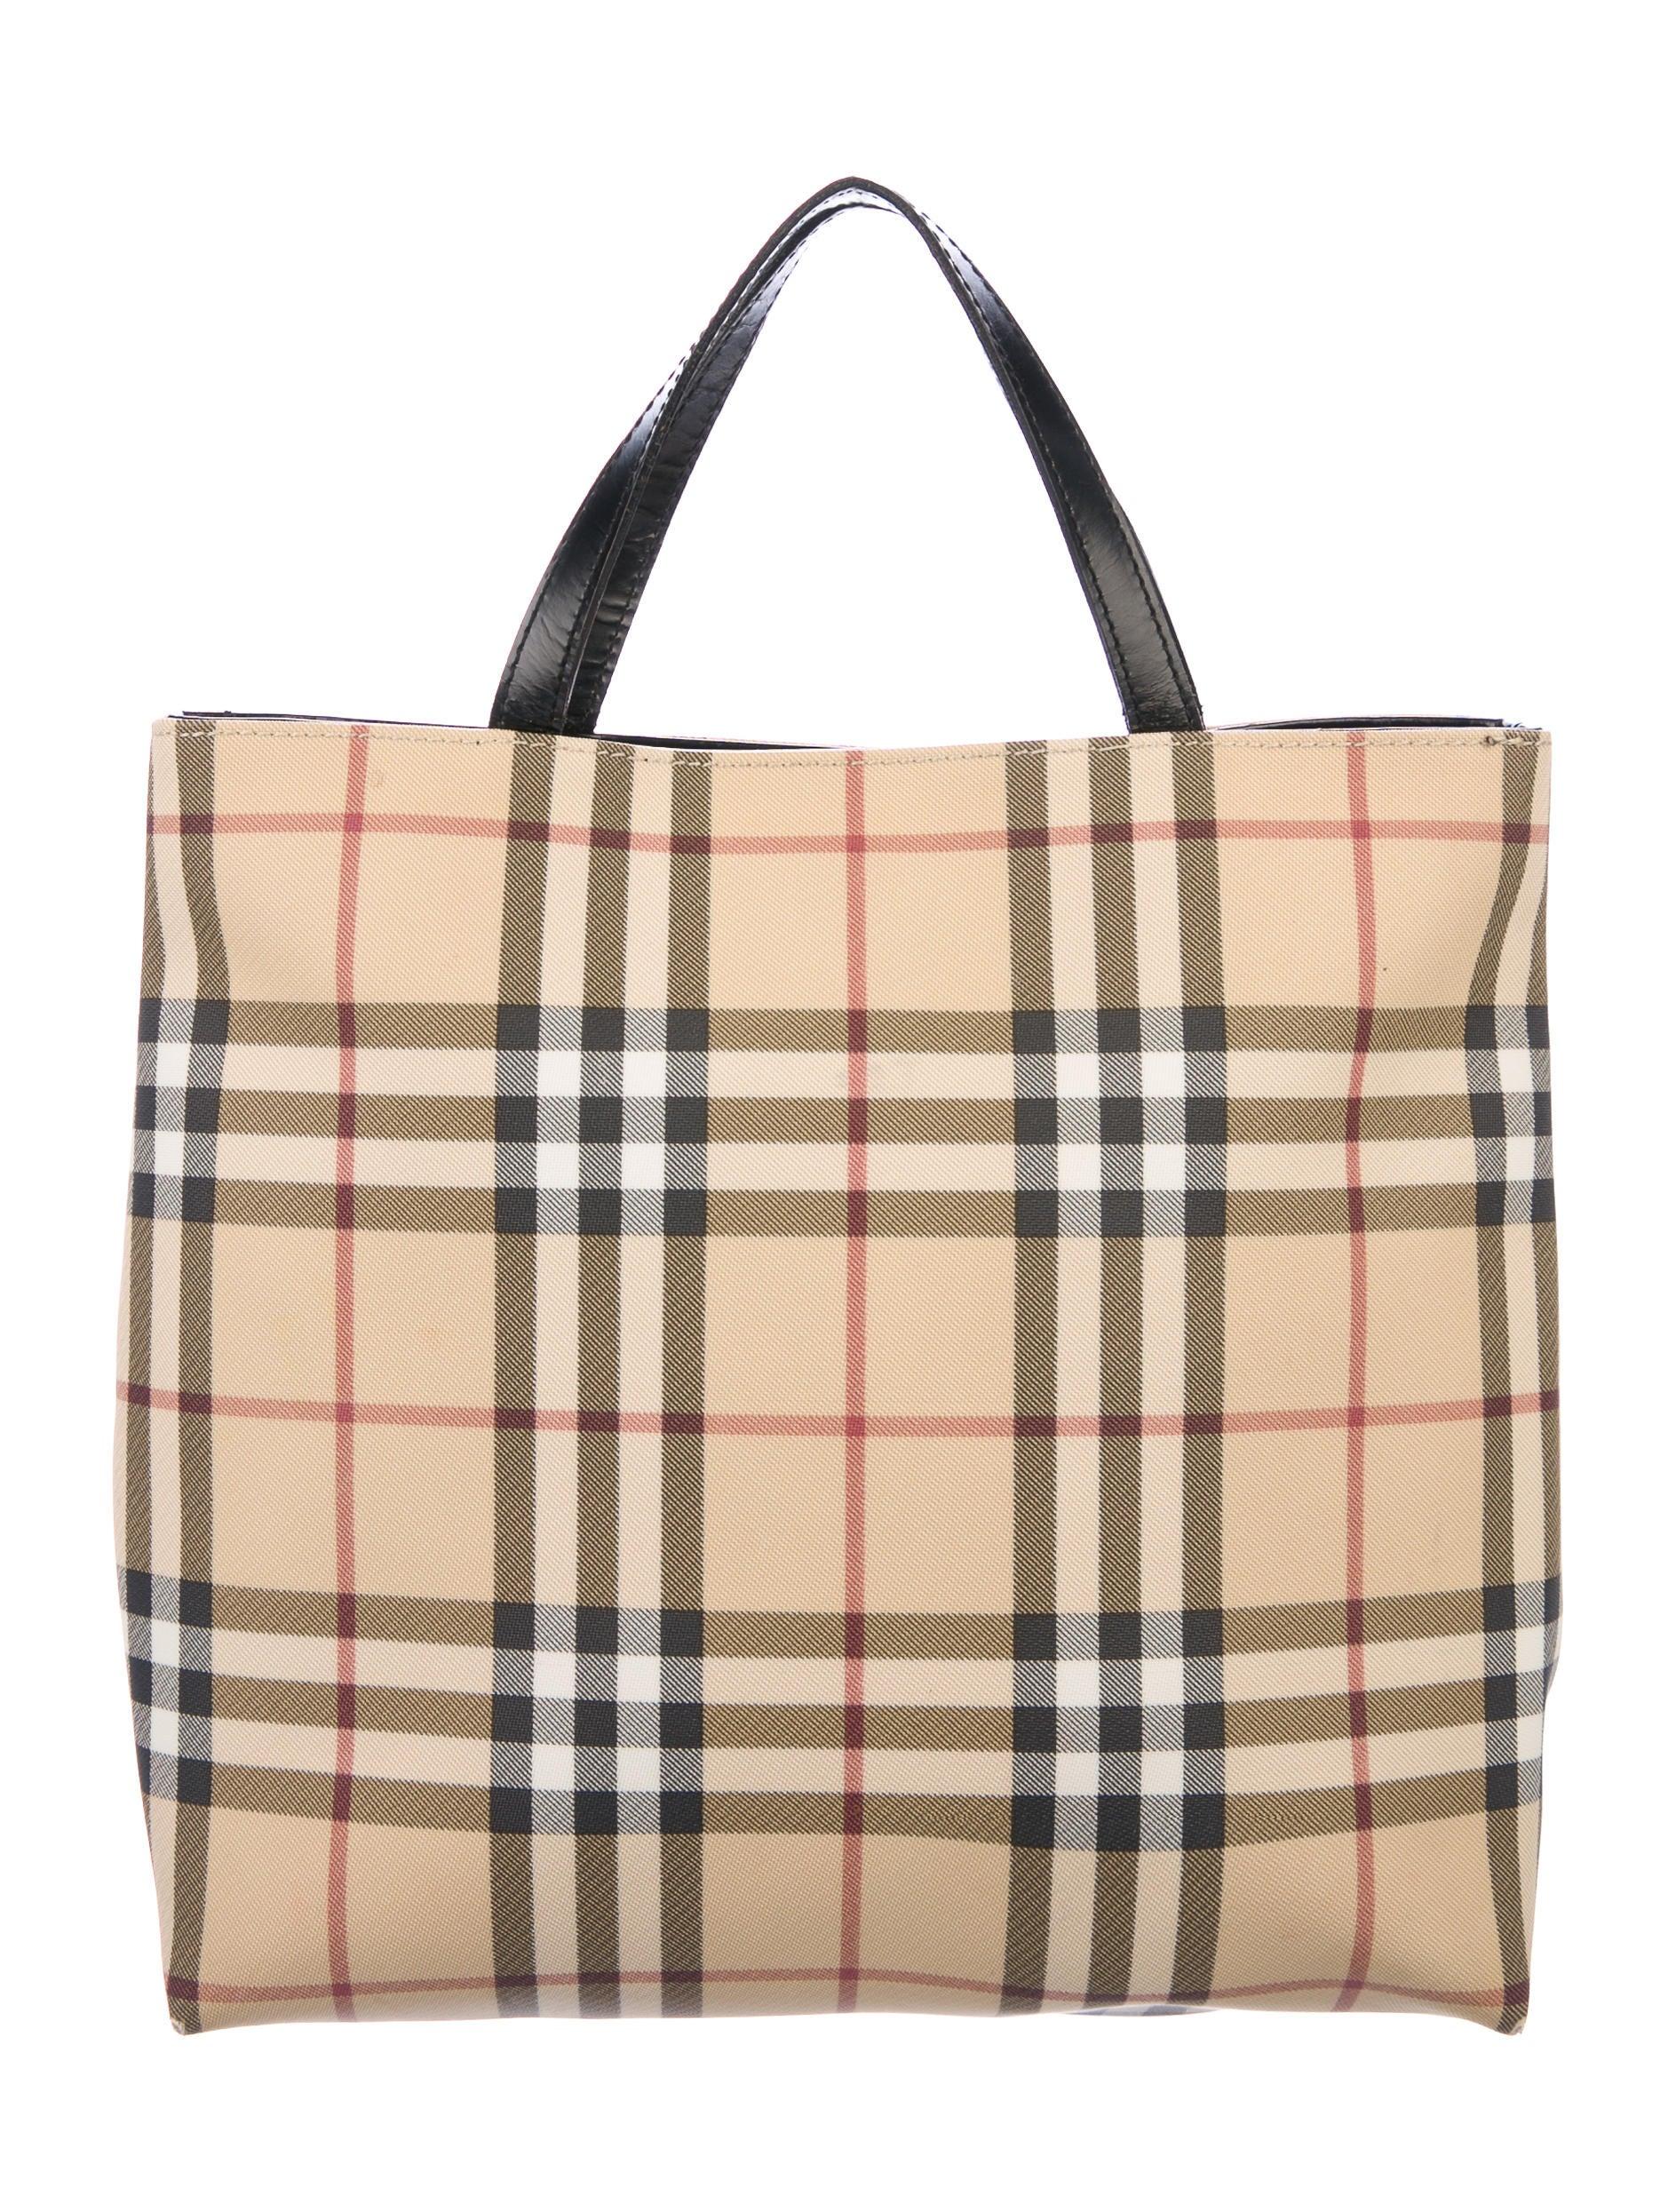 984f41b0a791 Burberry London Nova Check Tote - Handbags - WBURL29622